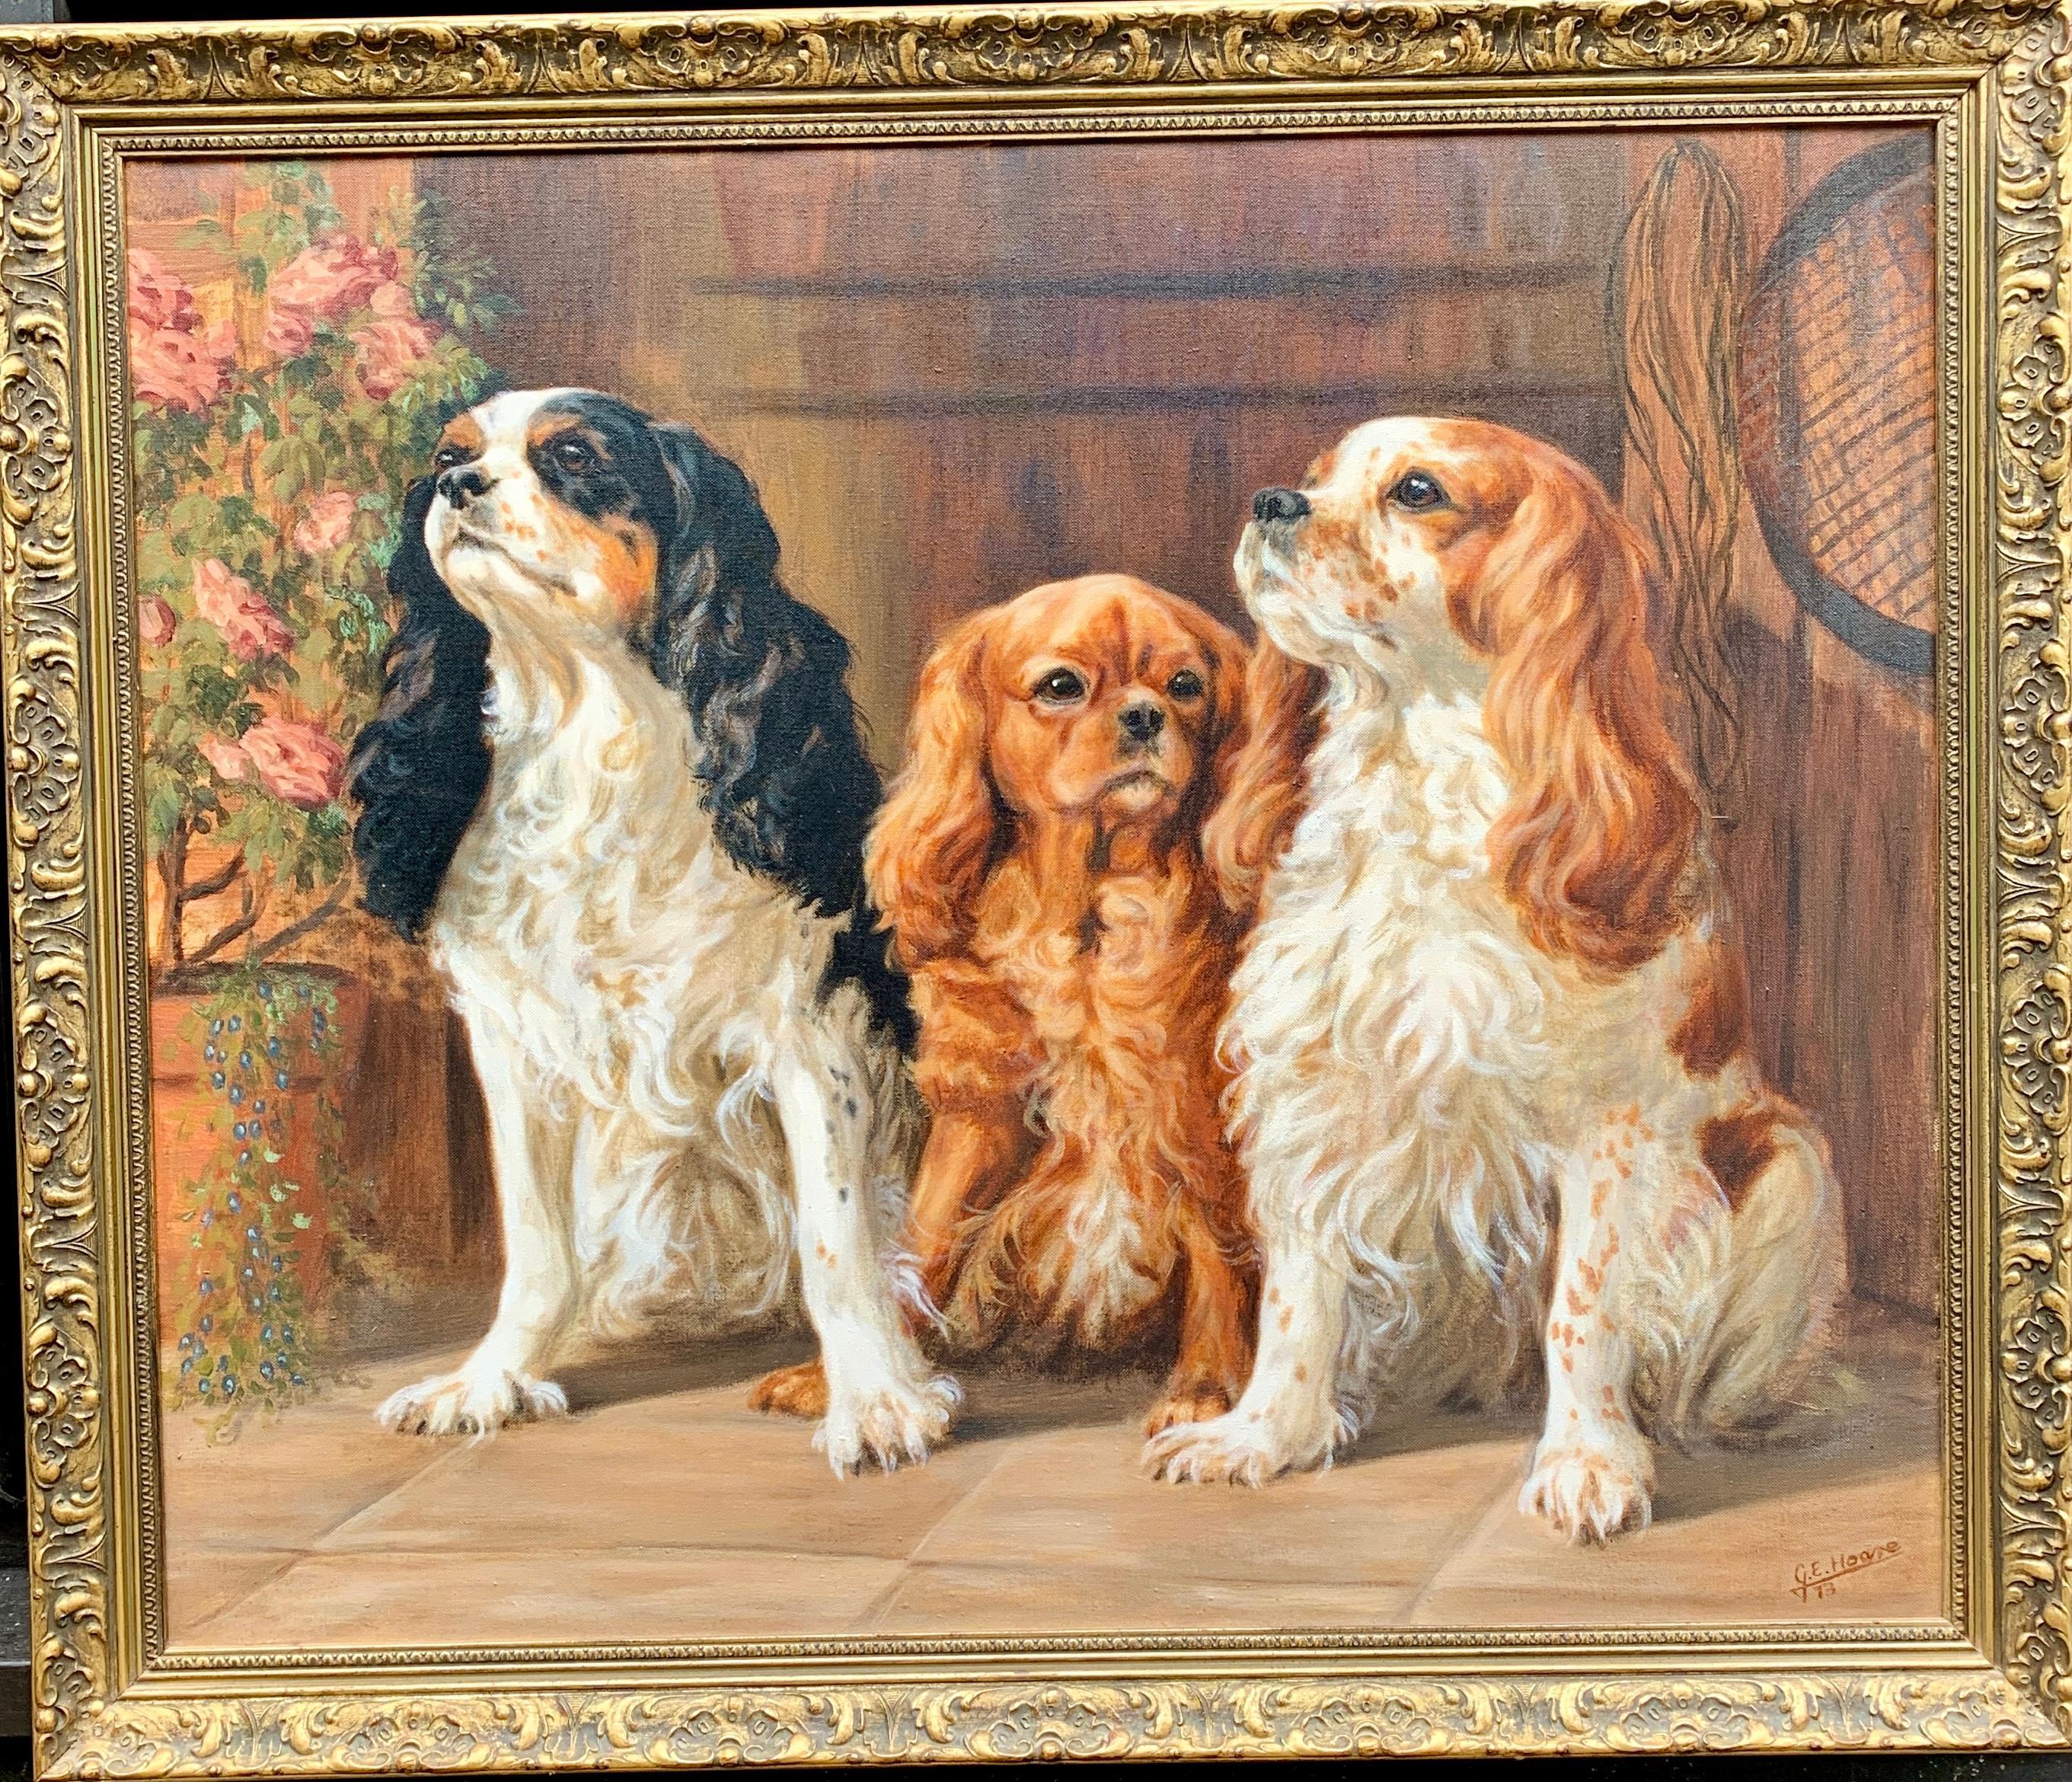 20th century English oil Portrait of three King Charles Cavalier Spaniels.